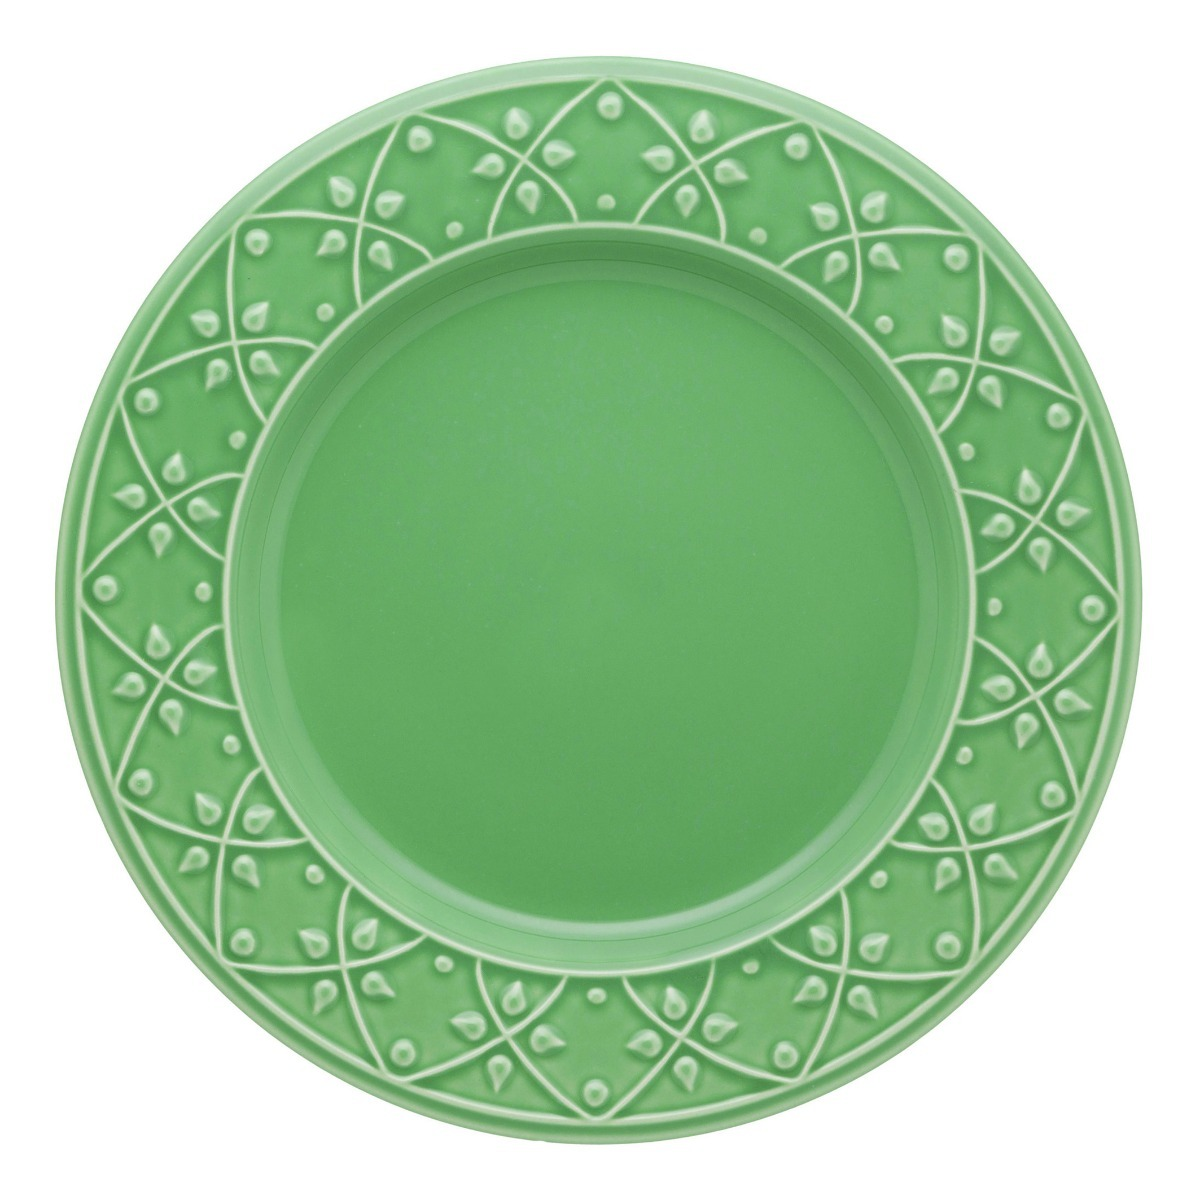 Plato Playo 26 Cm Ceramica Oxford Salvia Verde Fino Relieve